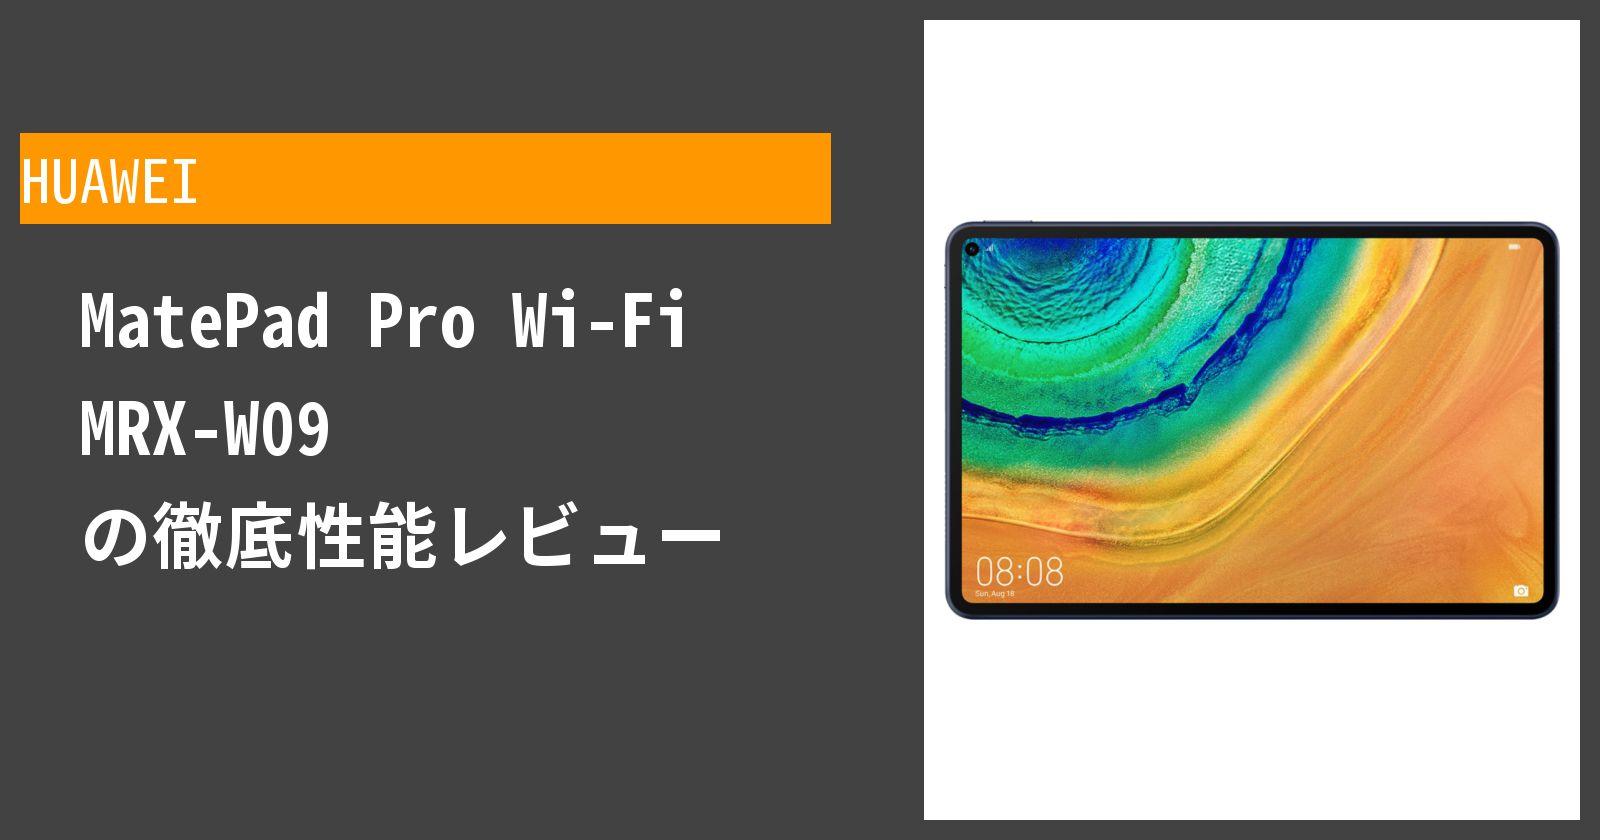 MatePad Pro Wi-Fi MRX-W09 の徹底性能レビュー